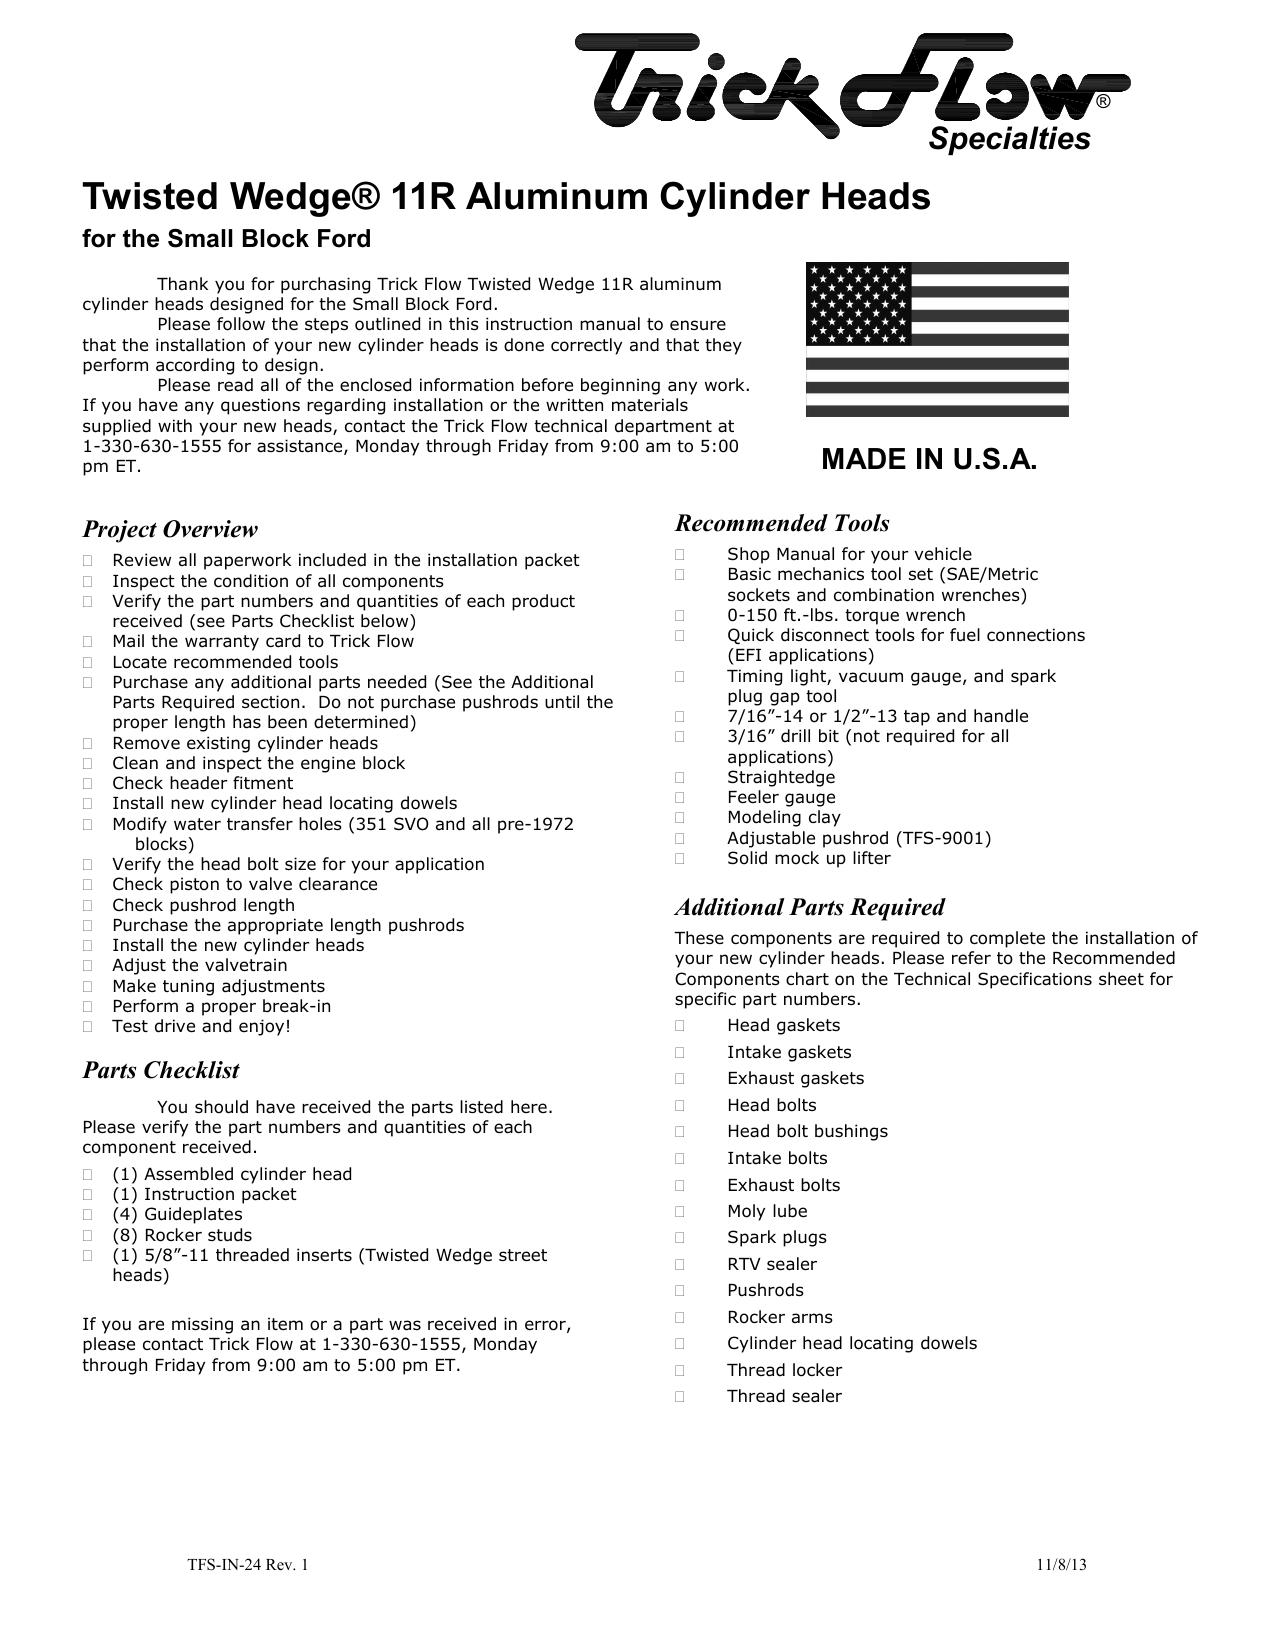 Twisted Wedge® 11R Aluminum Cylinder Heads   manualzz com